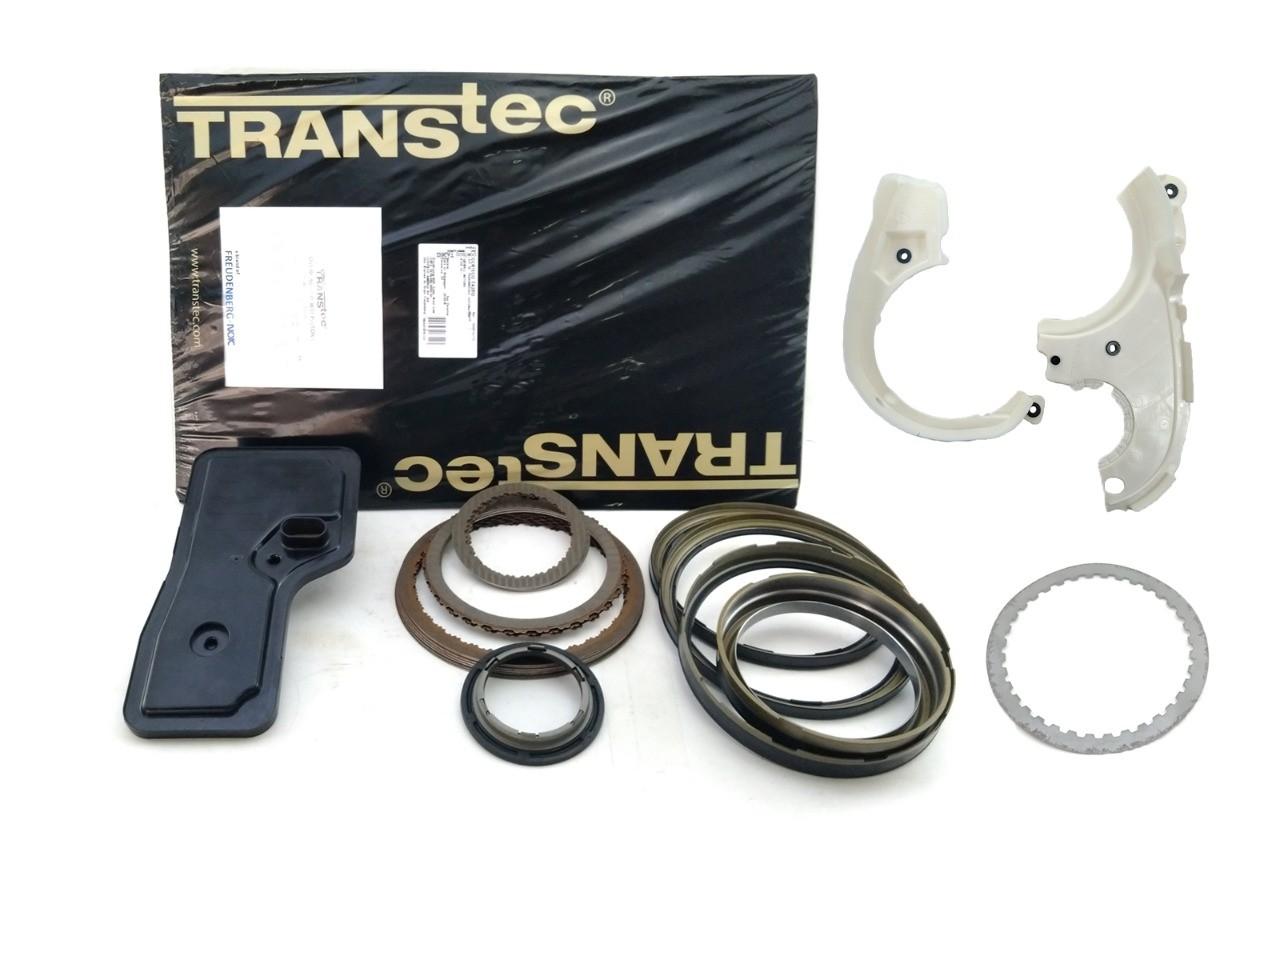 Kit Banner Transtec Cambio 6t30 Com Pistões Defletores Disco mola Filtro